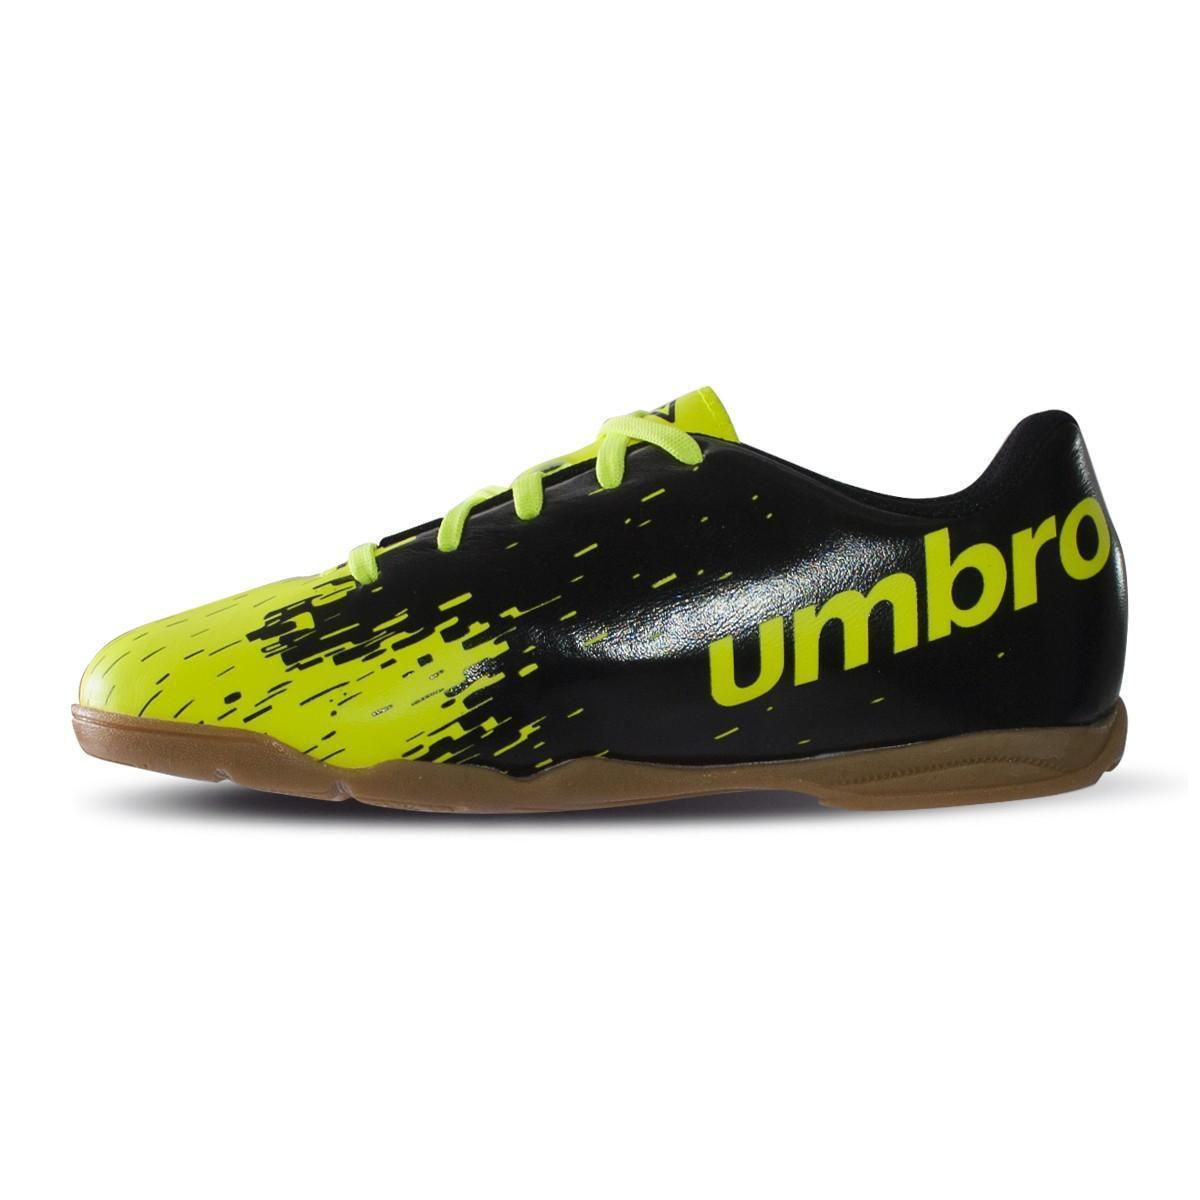 Chuteira Futsal Umbro Acid Jr - Limão/Preto